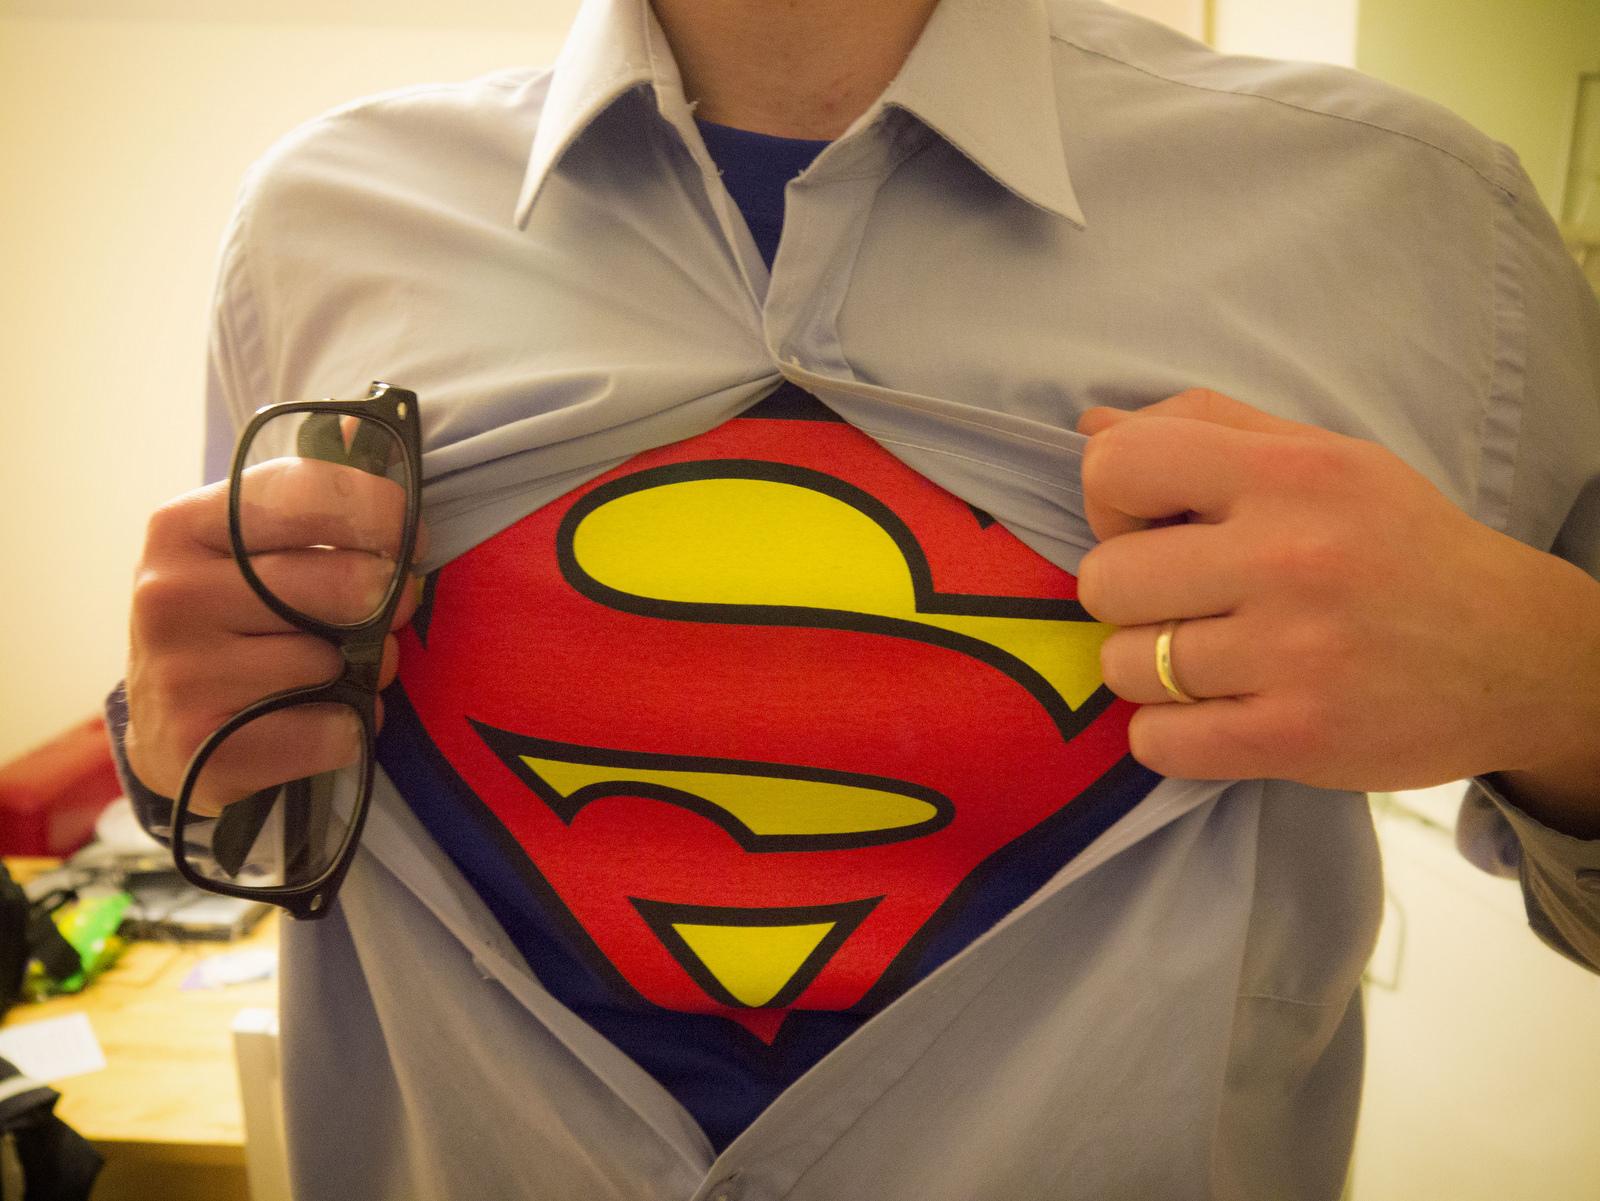 Man revealing his Superman undershirt